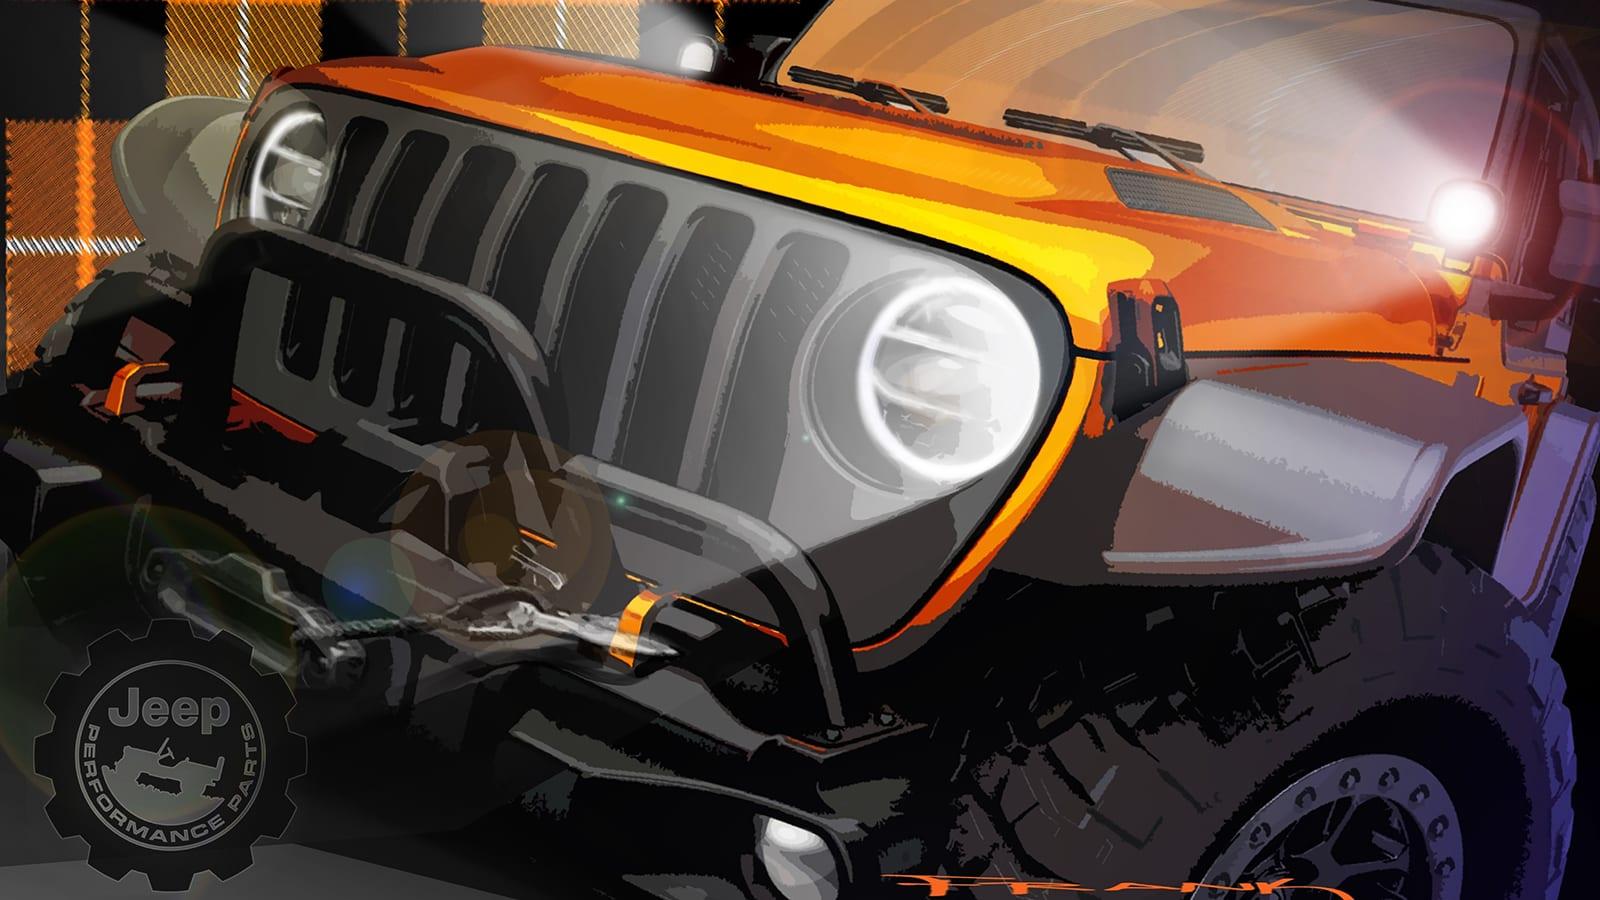 Easter Jeep Safari concept rendering